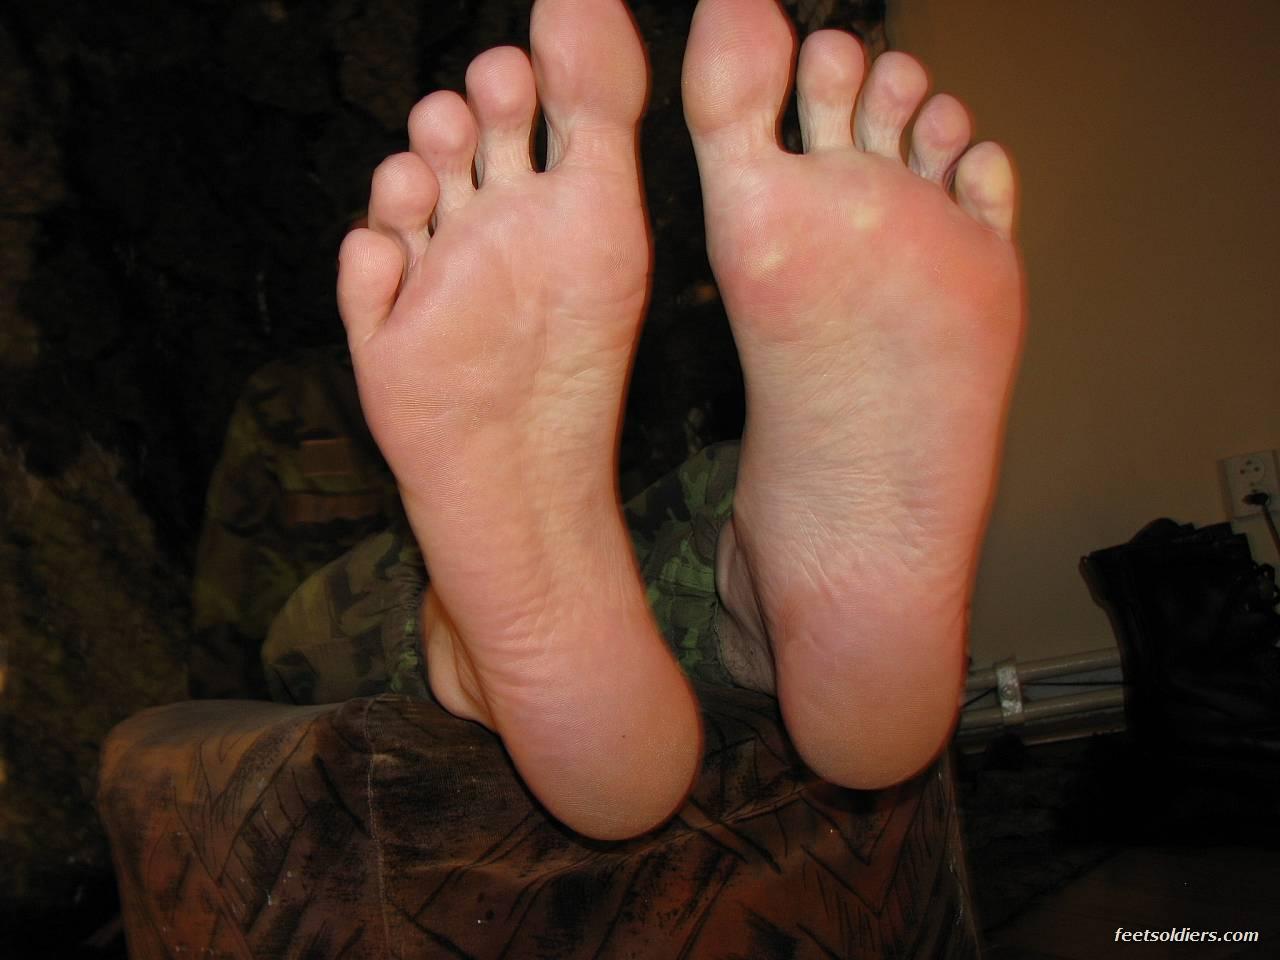 piedi fetish milano uomini gay superdotati